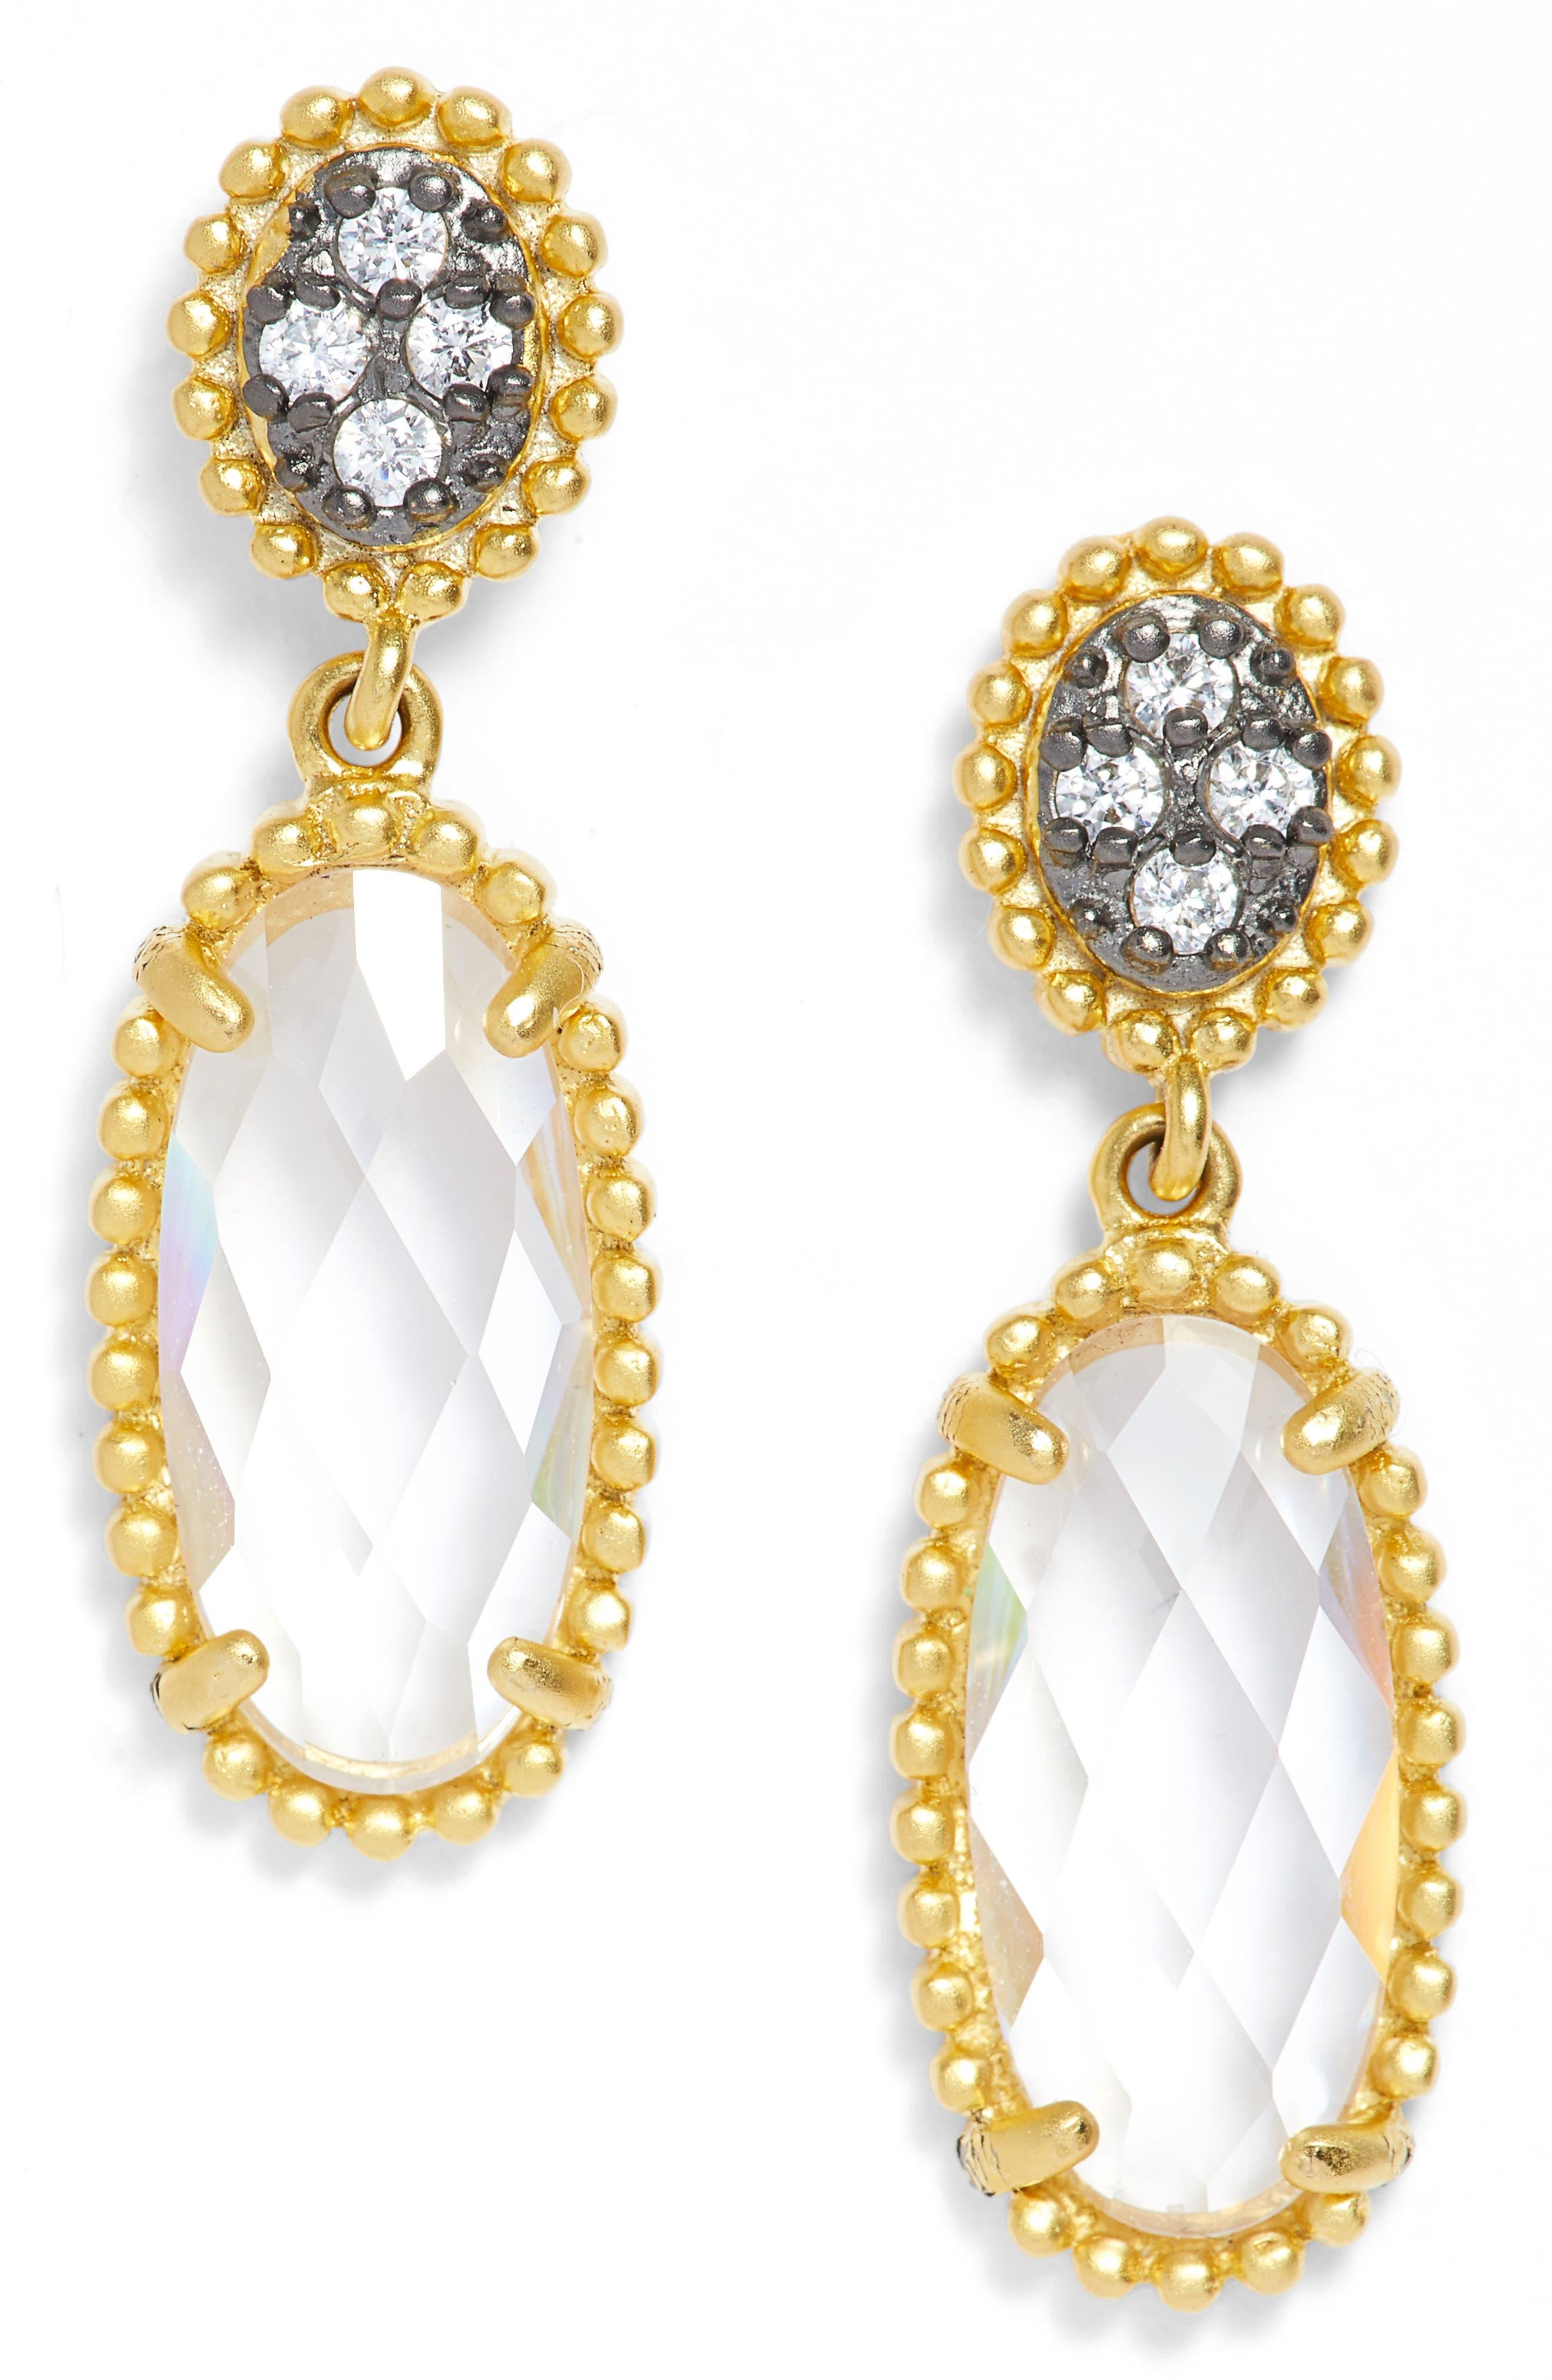 FRIEDA ROTHMAN Oval Drop Earrings,                             Main thumbnail 1, color,                             Gold/ Black Rhodium